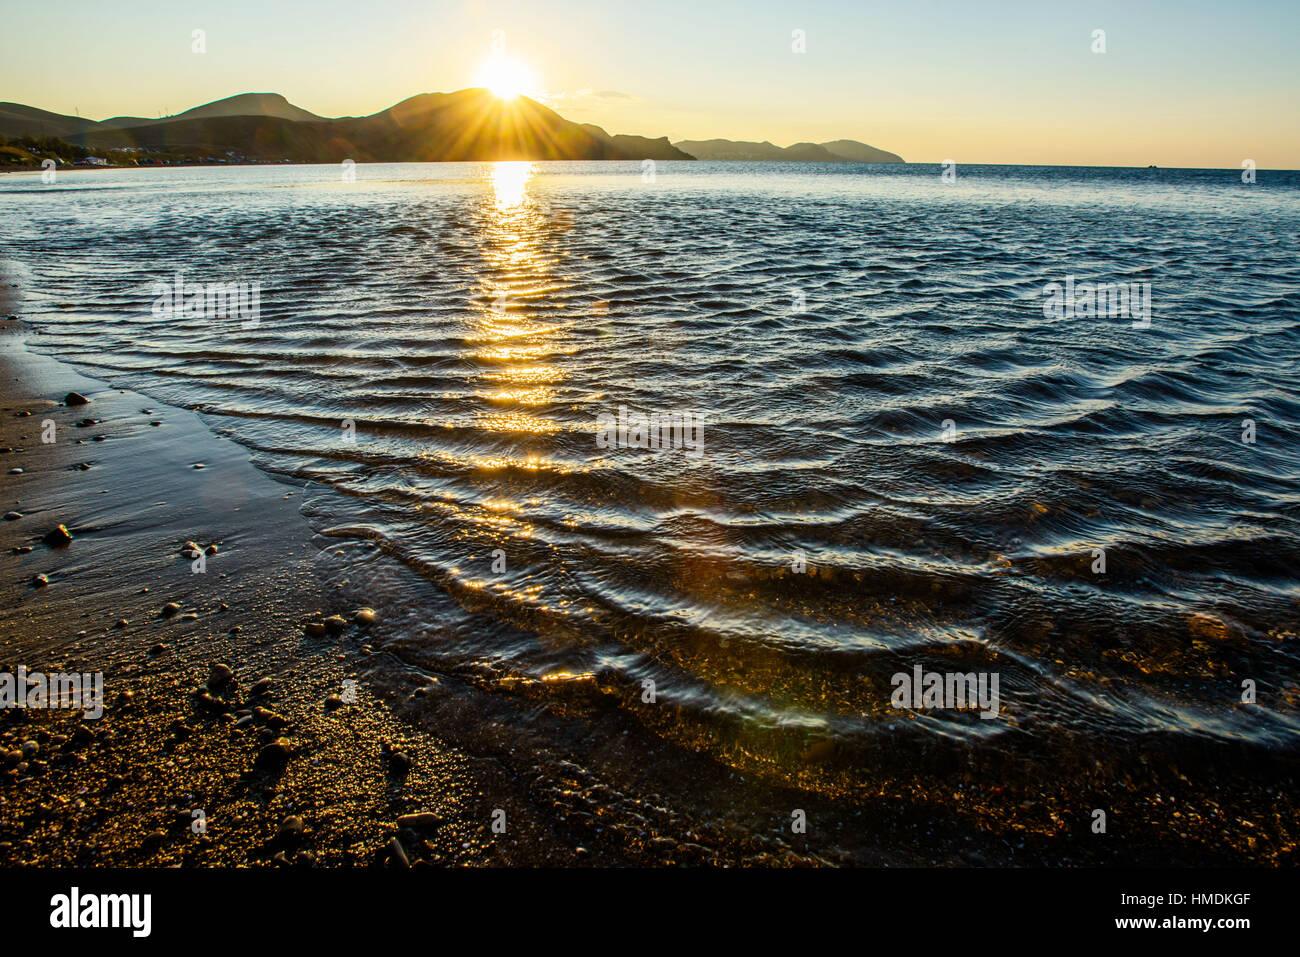 mystischen Sonnenaufgang des Meeres Stockbild